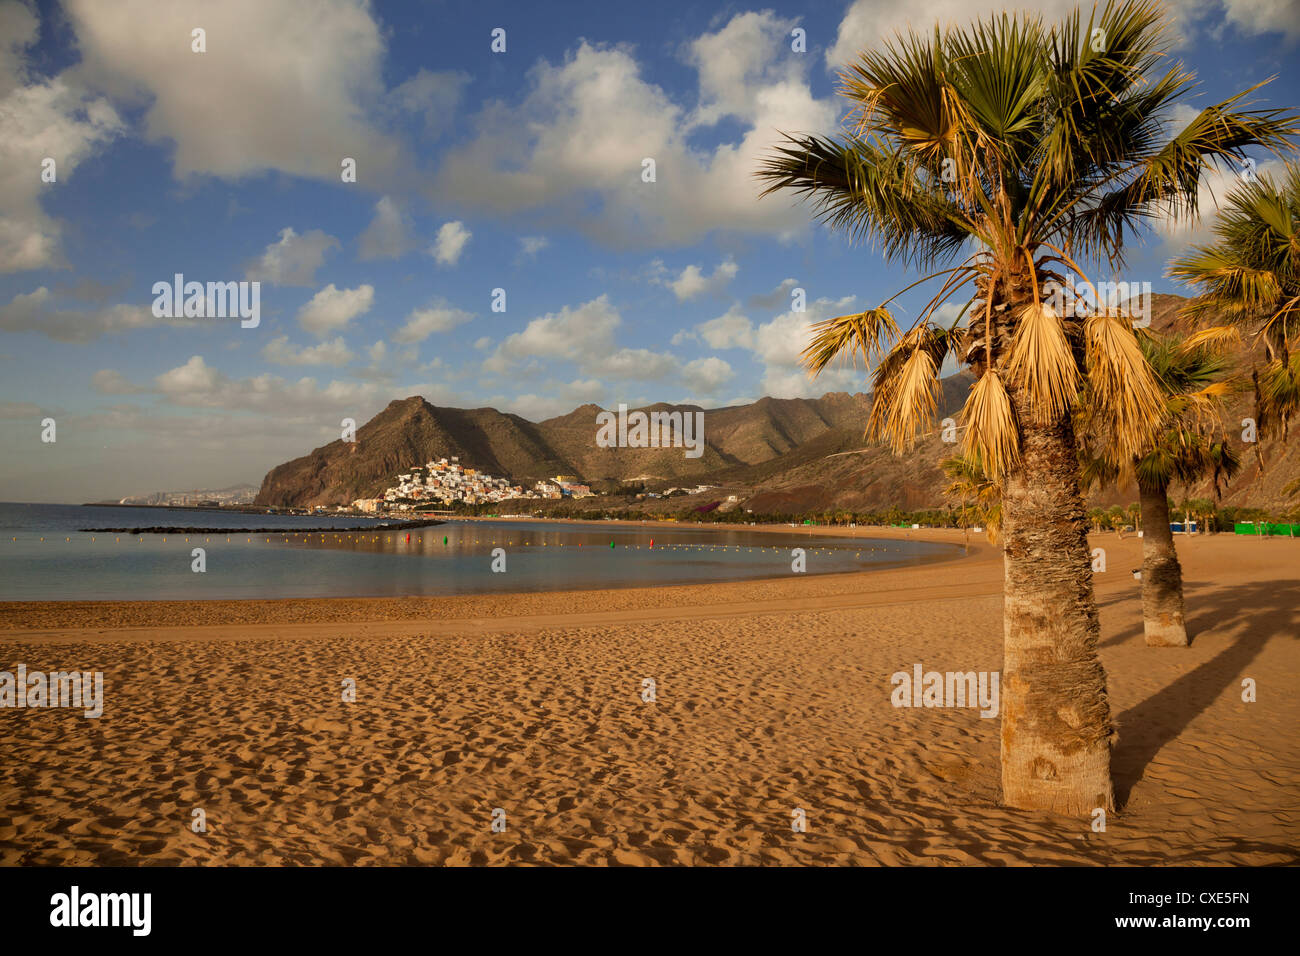 Playa de las Teresitas in early morning light, Tenerife, Canary Islands, Spain, Europe. - Stock Image